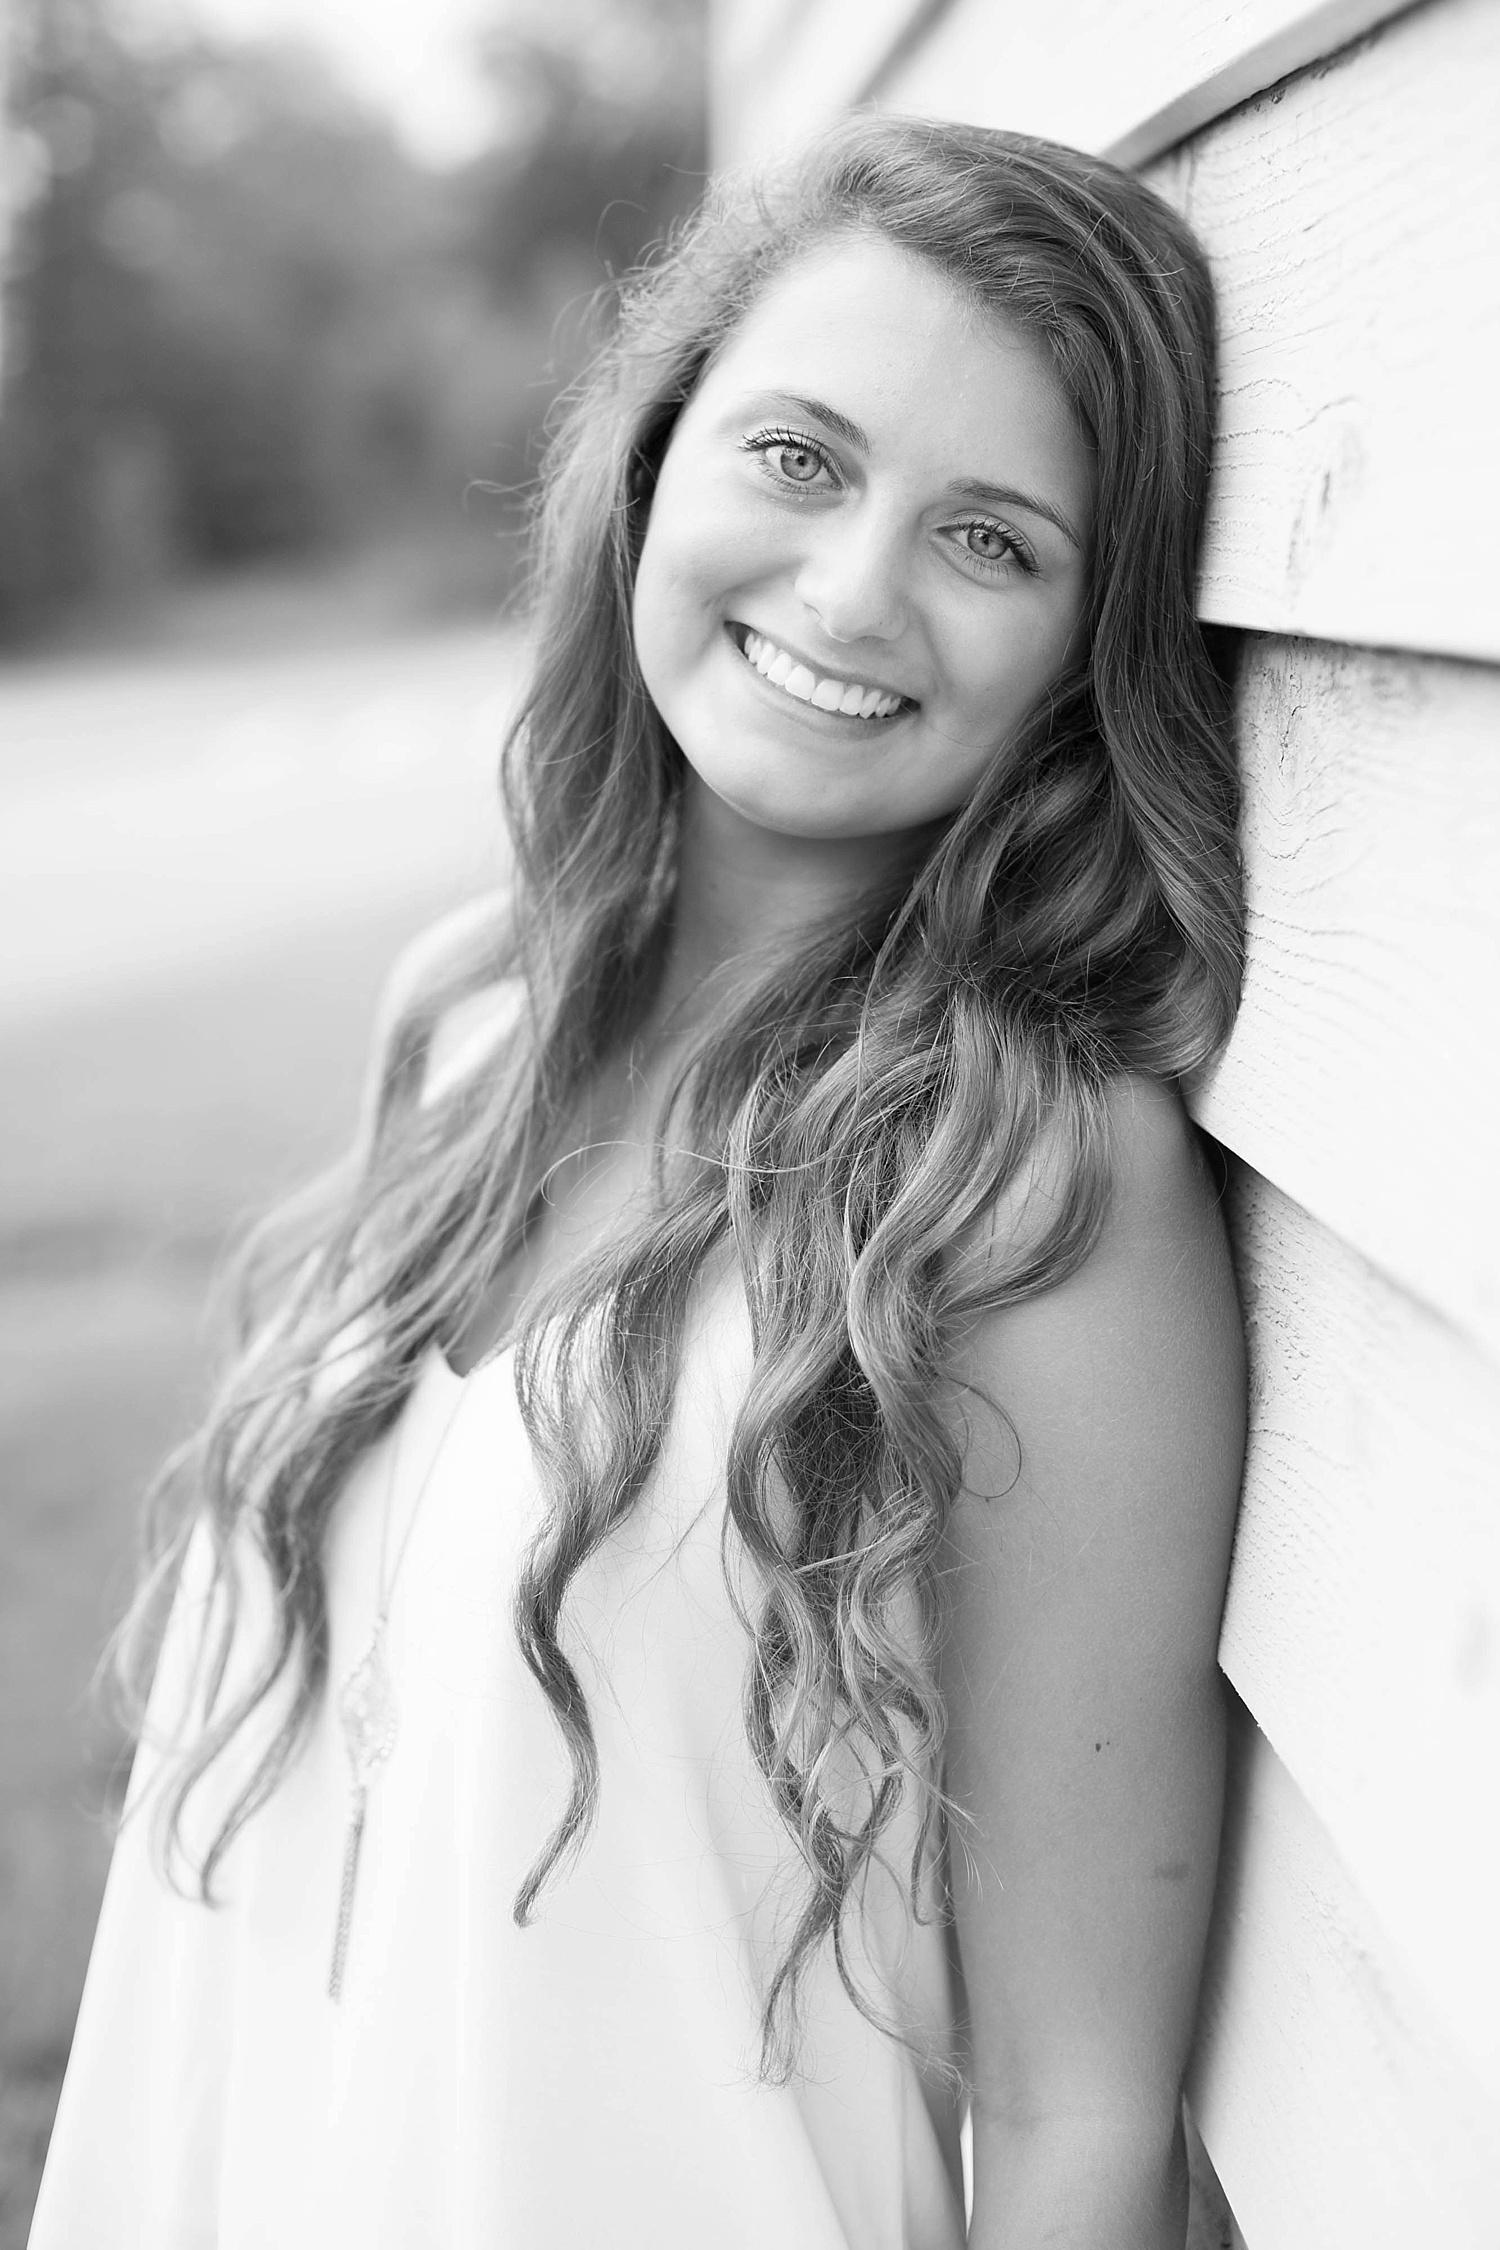 Senior Portraits | Ashley Powell | Roanoke, VA Photographer